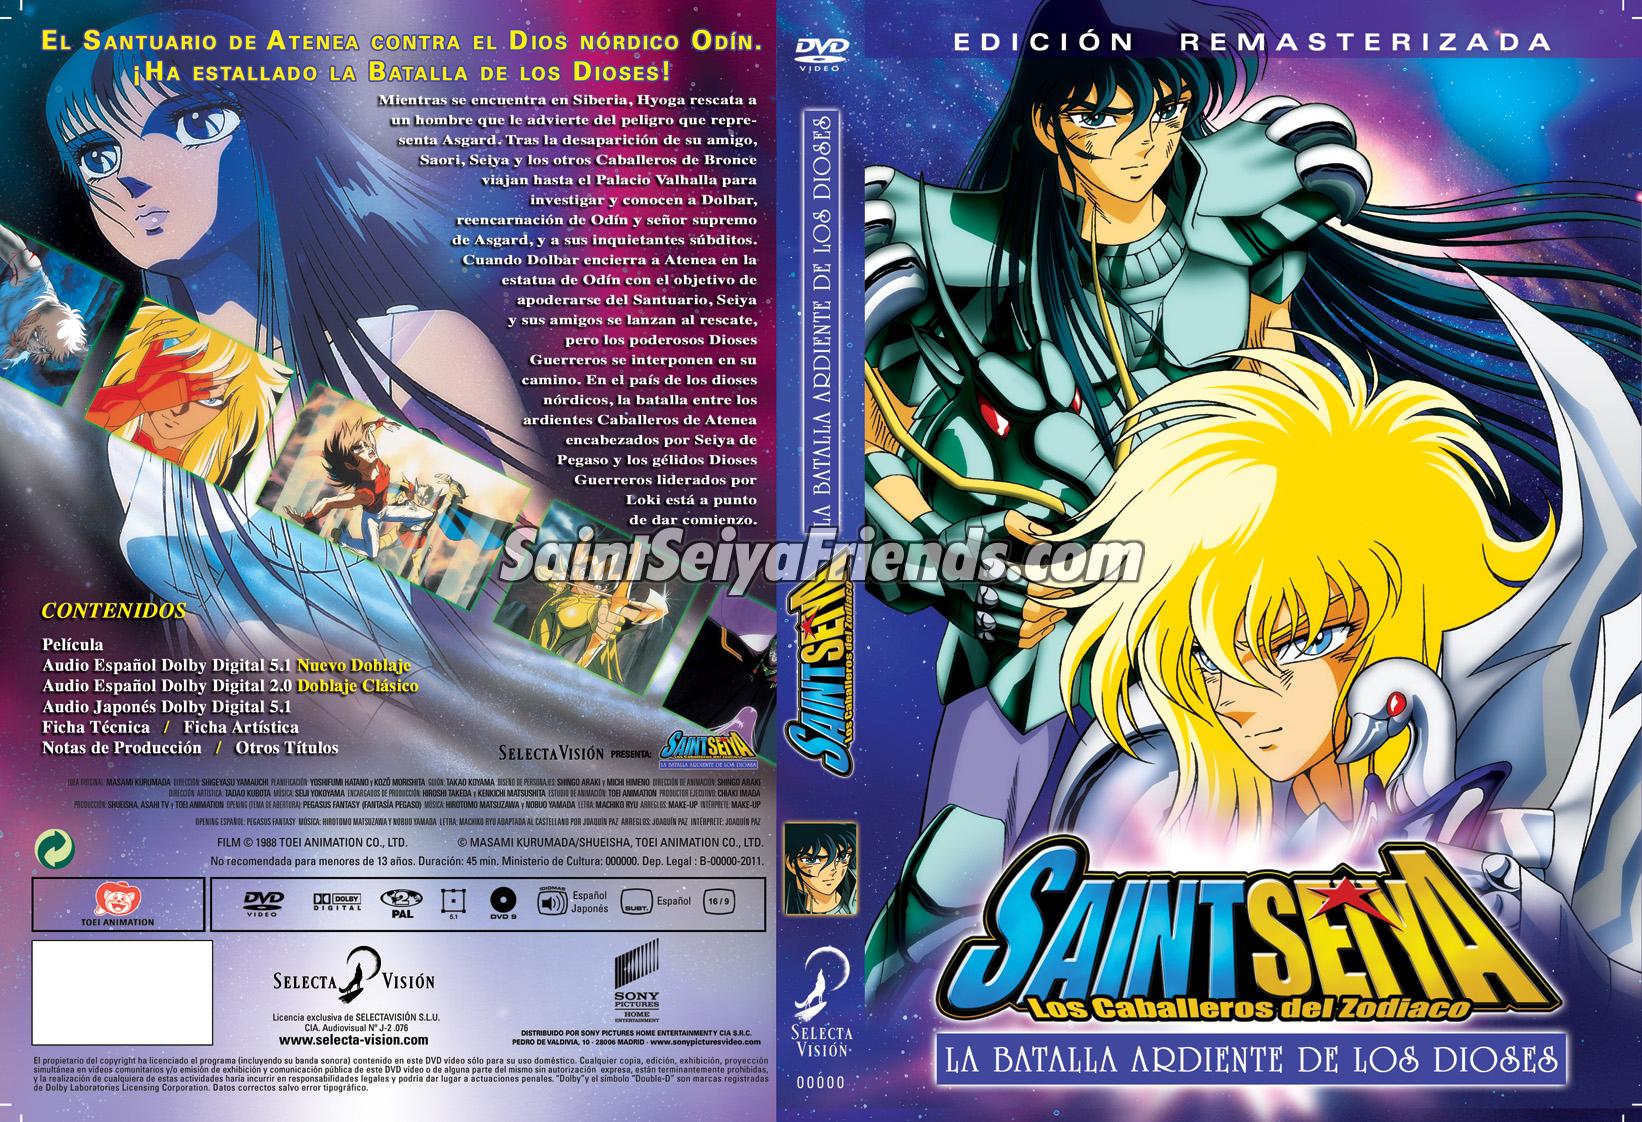 Covers de manga, anime y otros 6153835316_19fcea3a3c_o